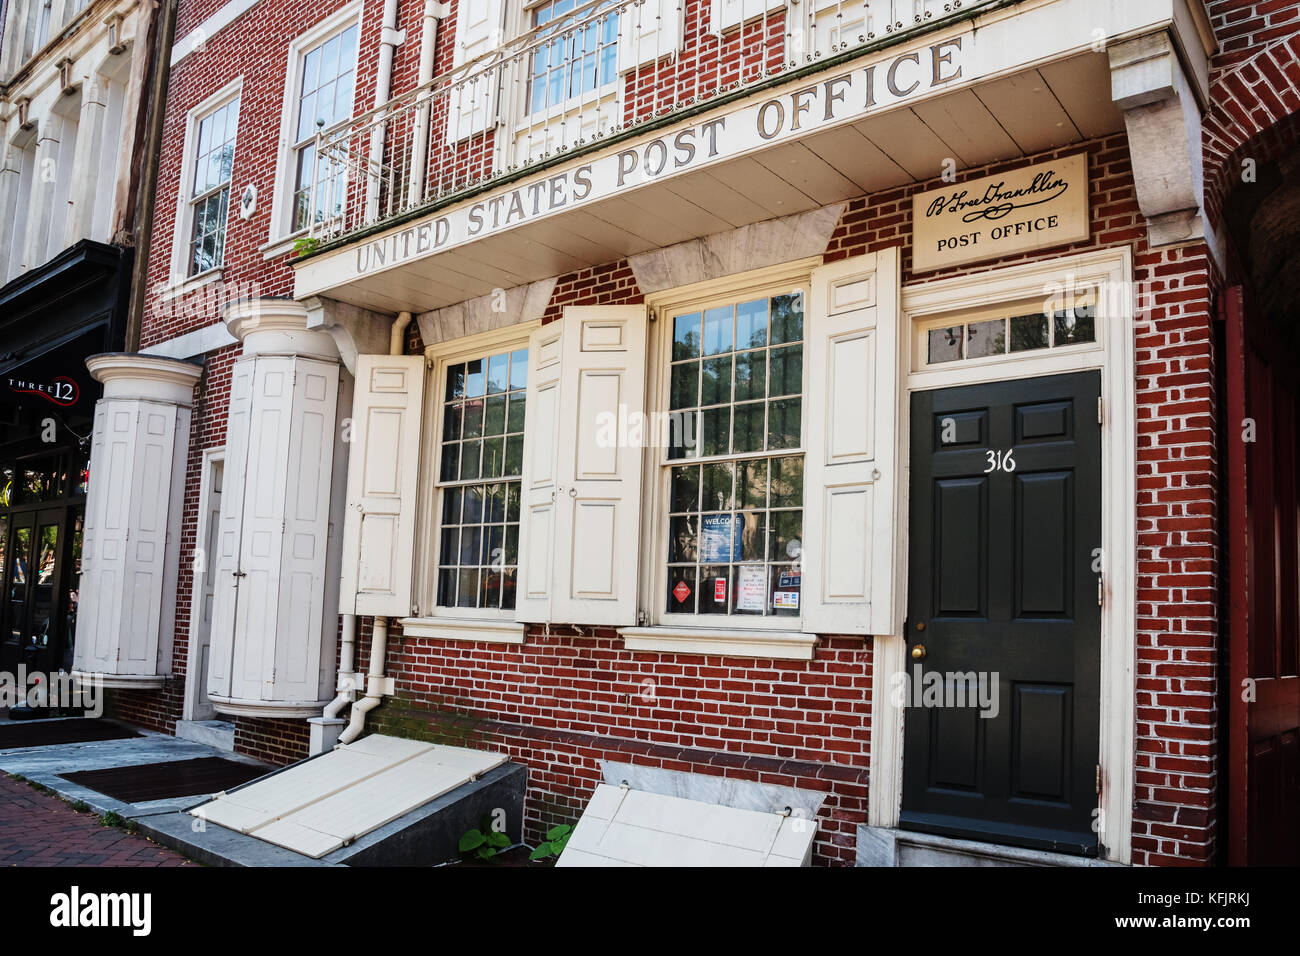 Elegant Franklin Post Office, Americau0027s First Public Postal Service, Philadelphia,  Pennsylvania, USA